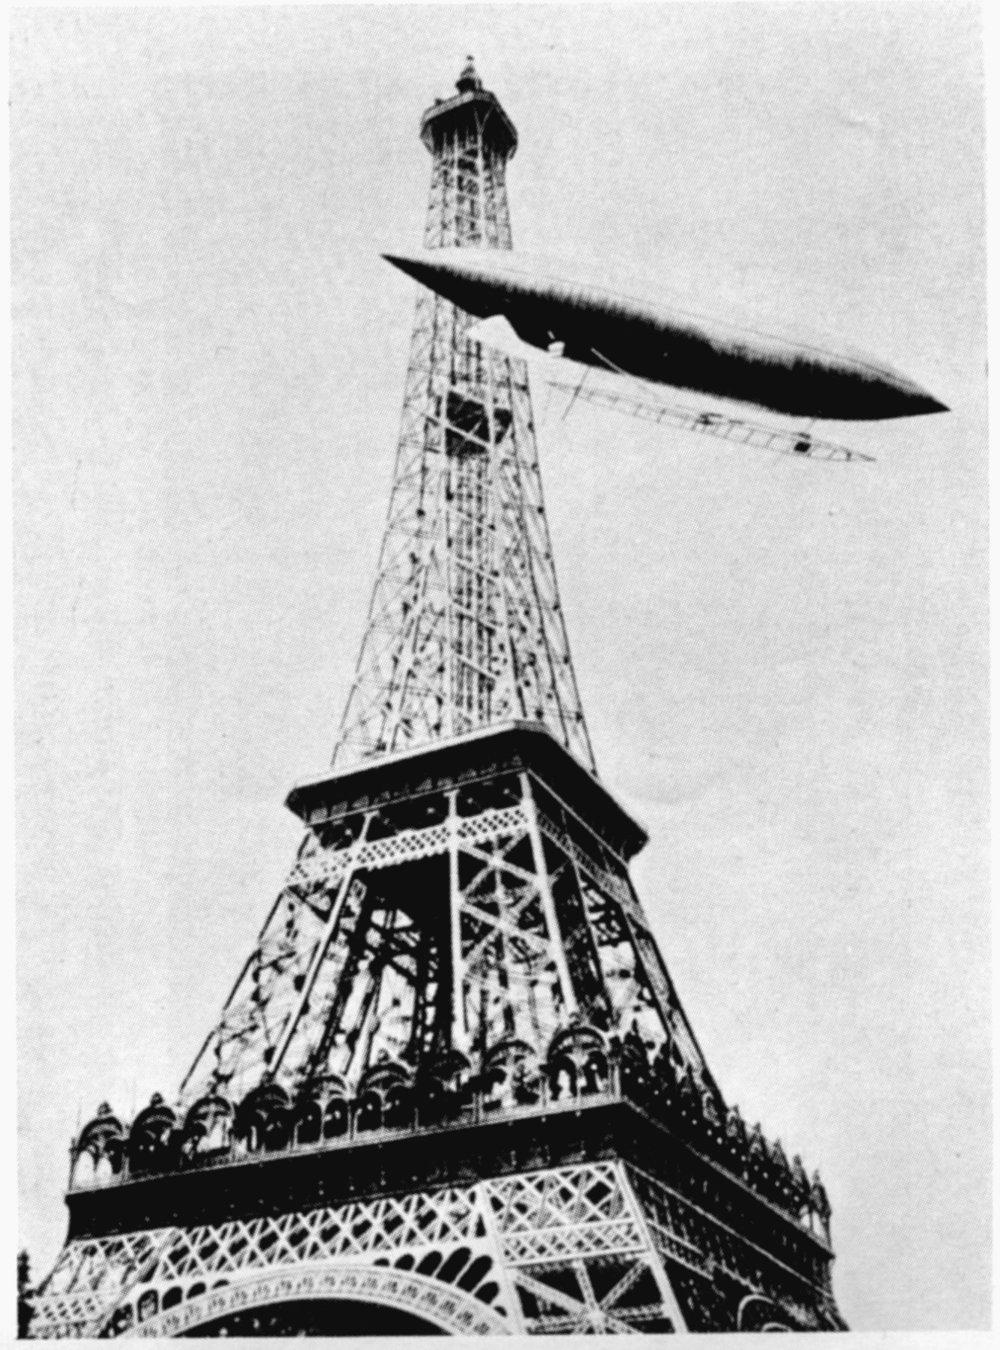 Figure 7: Alberto Santos –Dumont circling the Eiffel Tower. Reproduced in Gustave Eiffel, La tour Eiffel en 1900, p. 263.